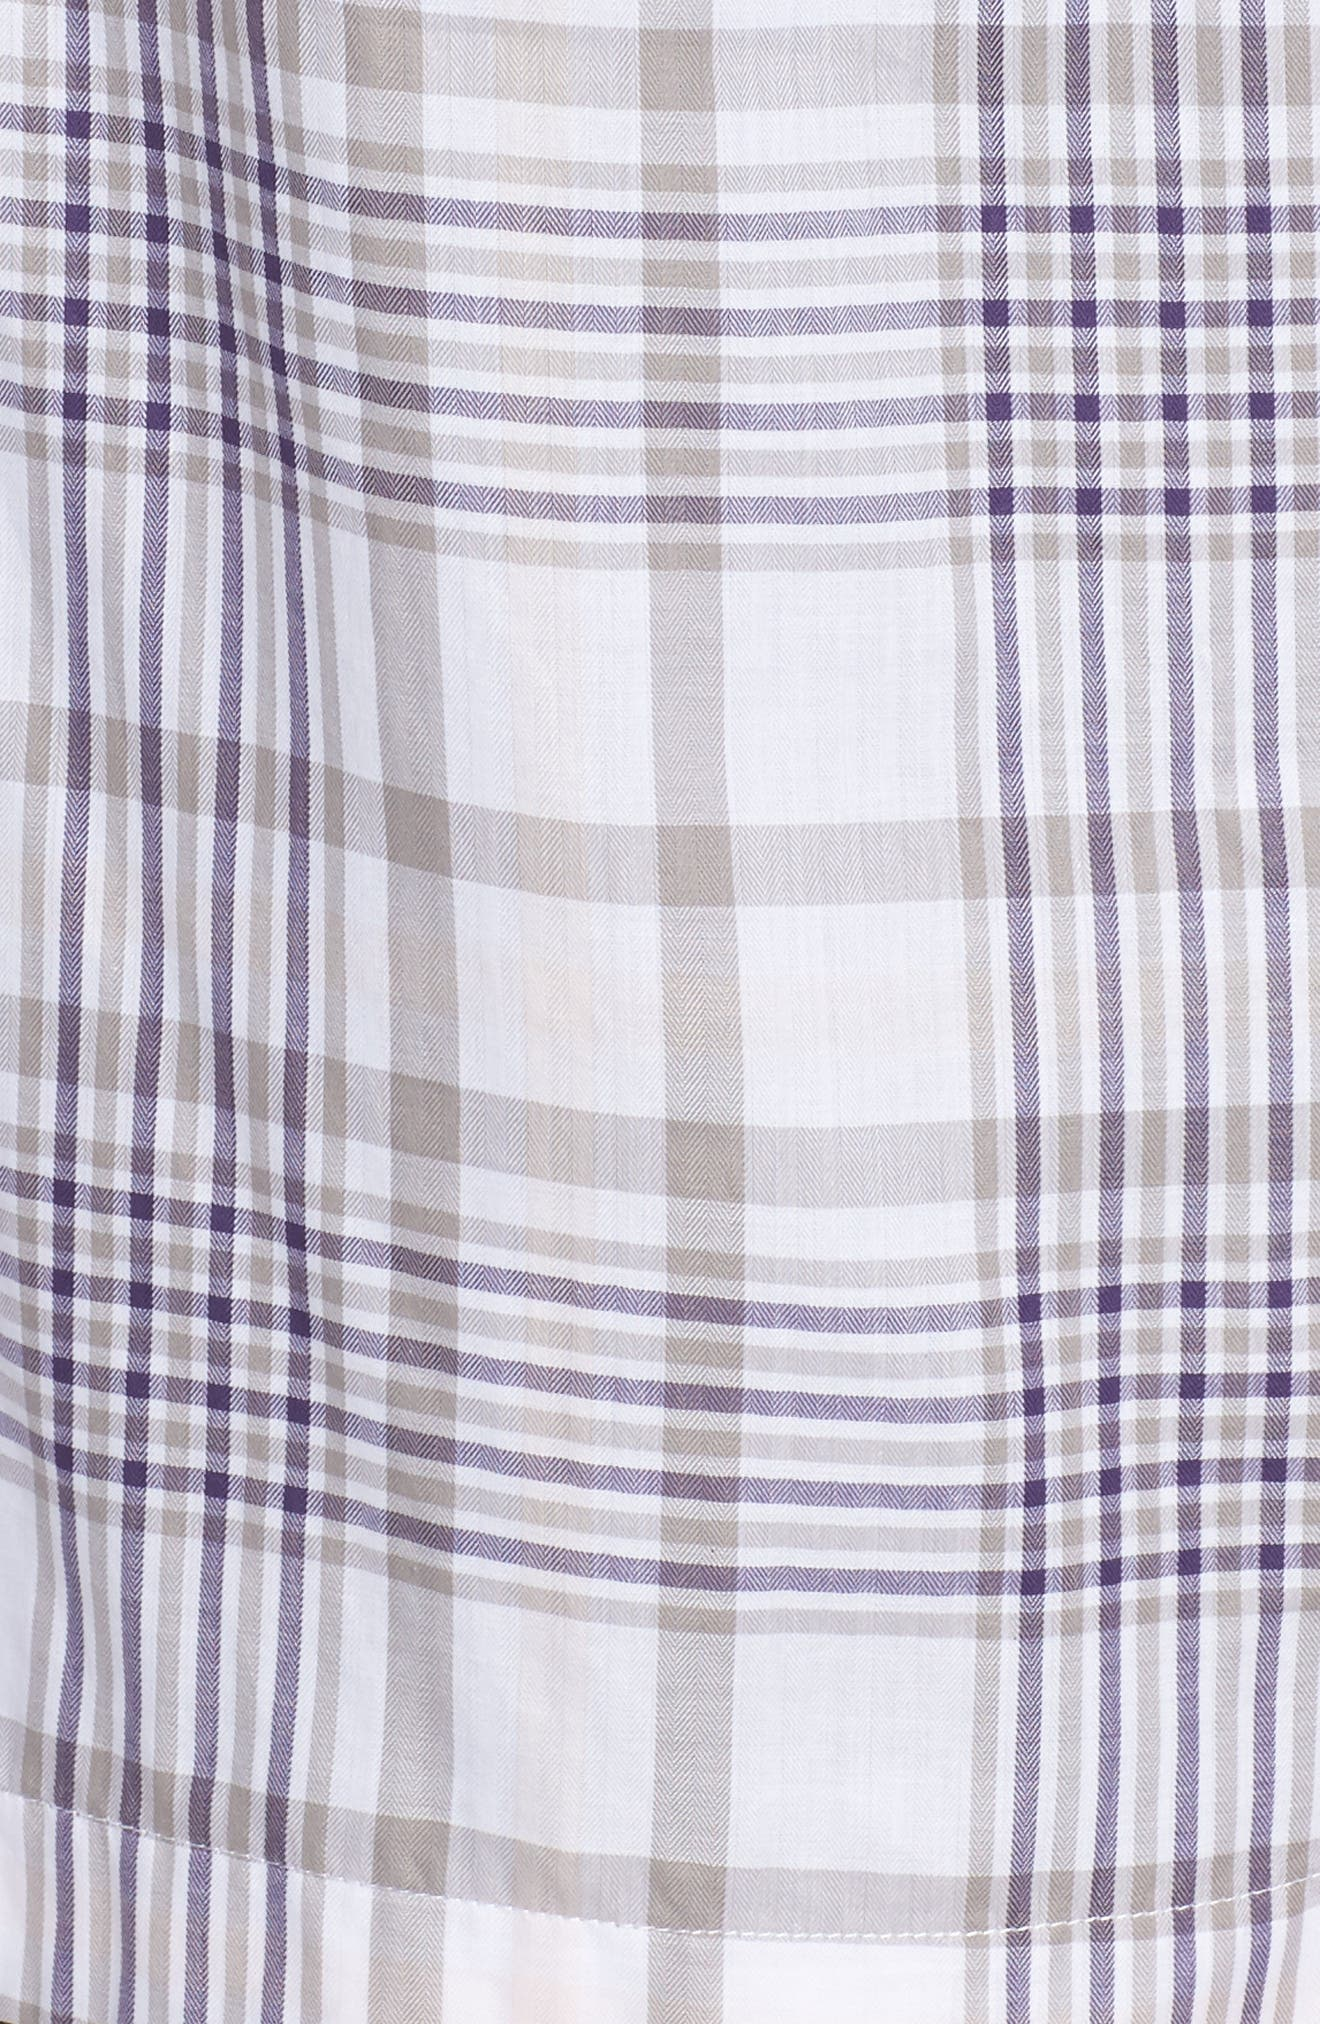 Maddy Winter Plaid Shirt,                             Alternate thumbnail 5, color,                             037